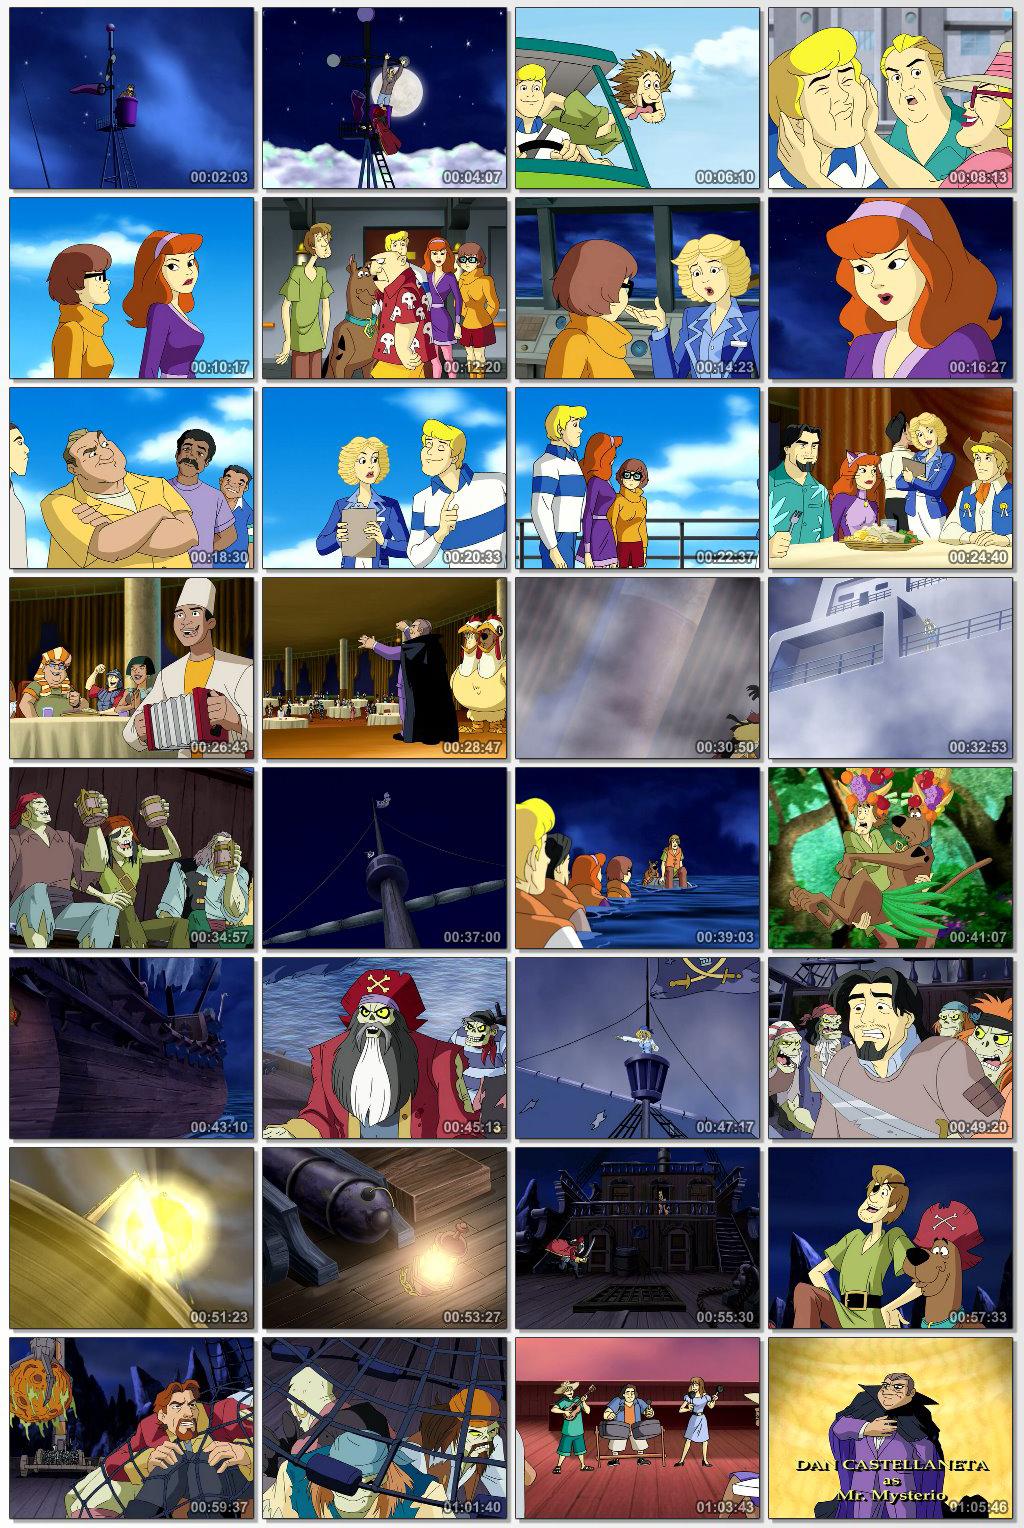 دانلود انیمیشن کارتونی Scooby Doo Pirates Ahoy 2006